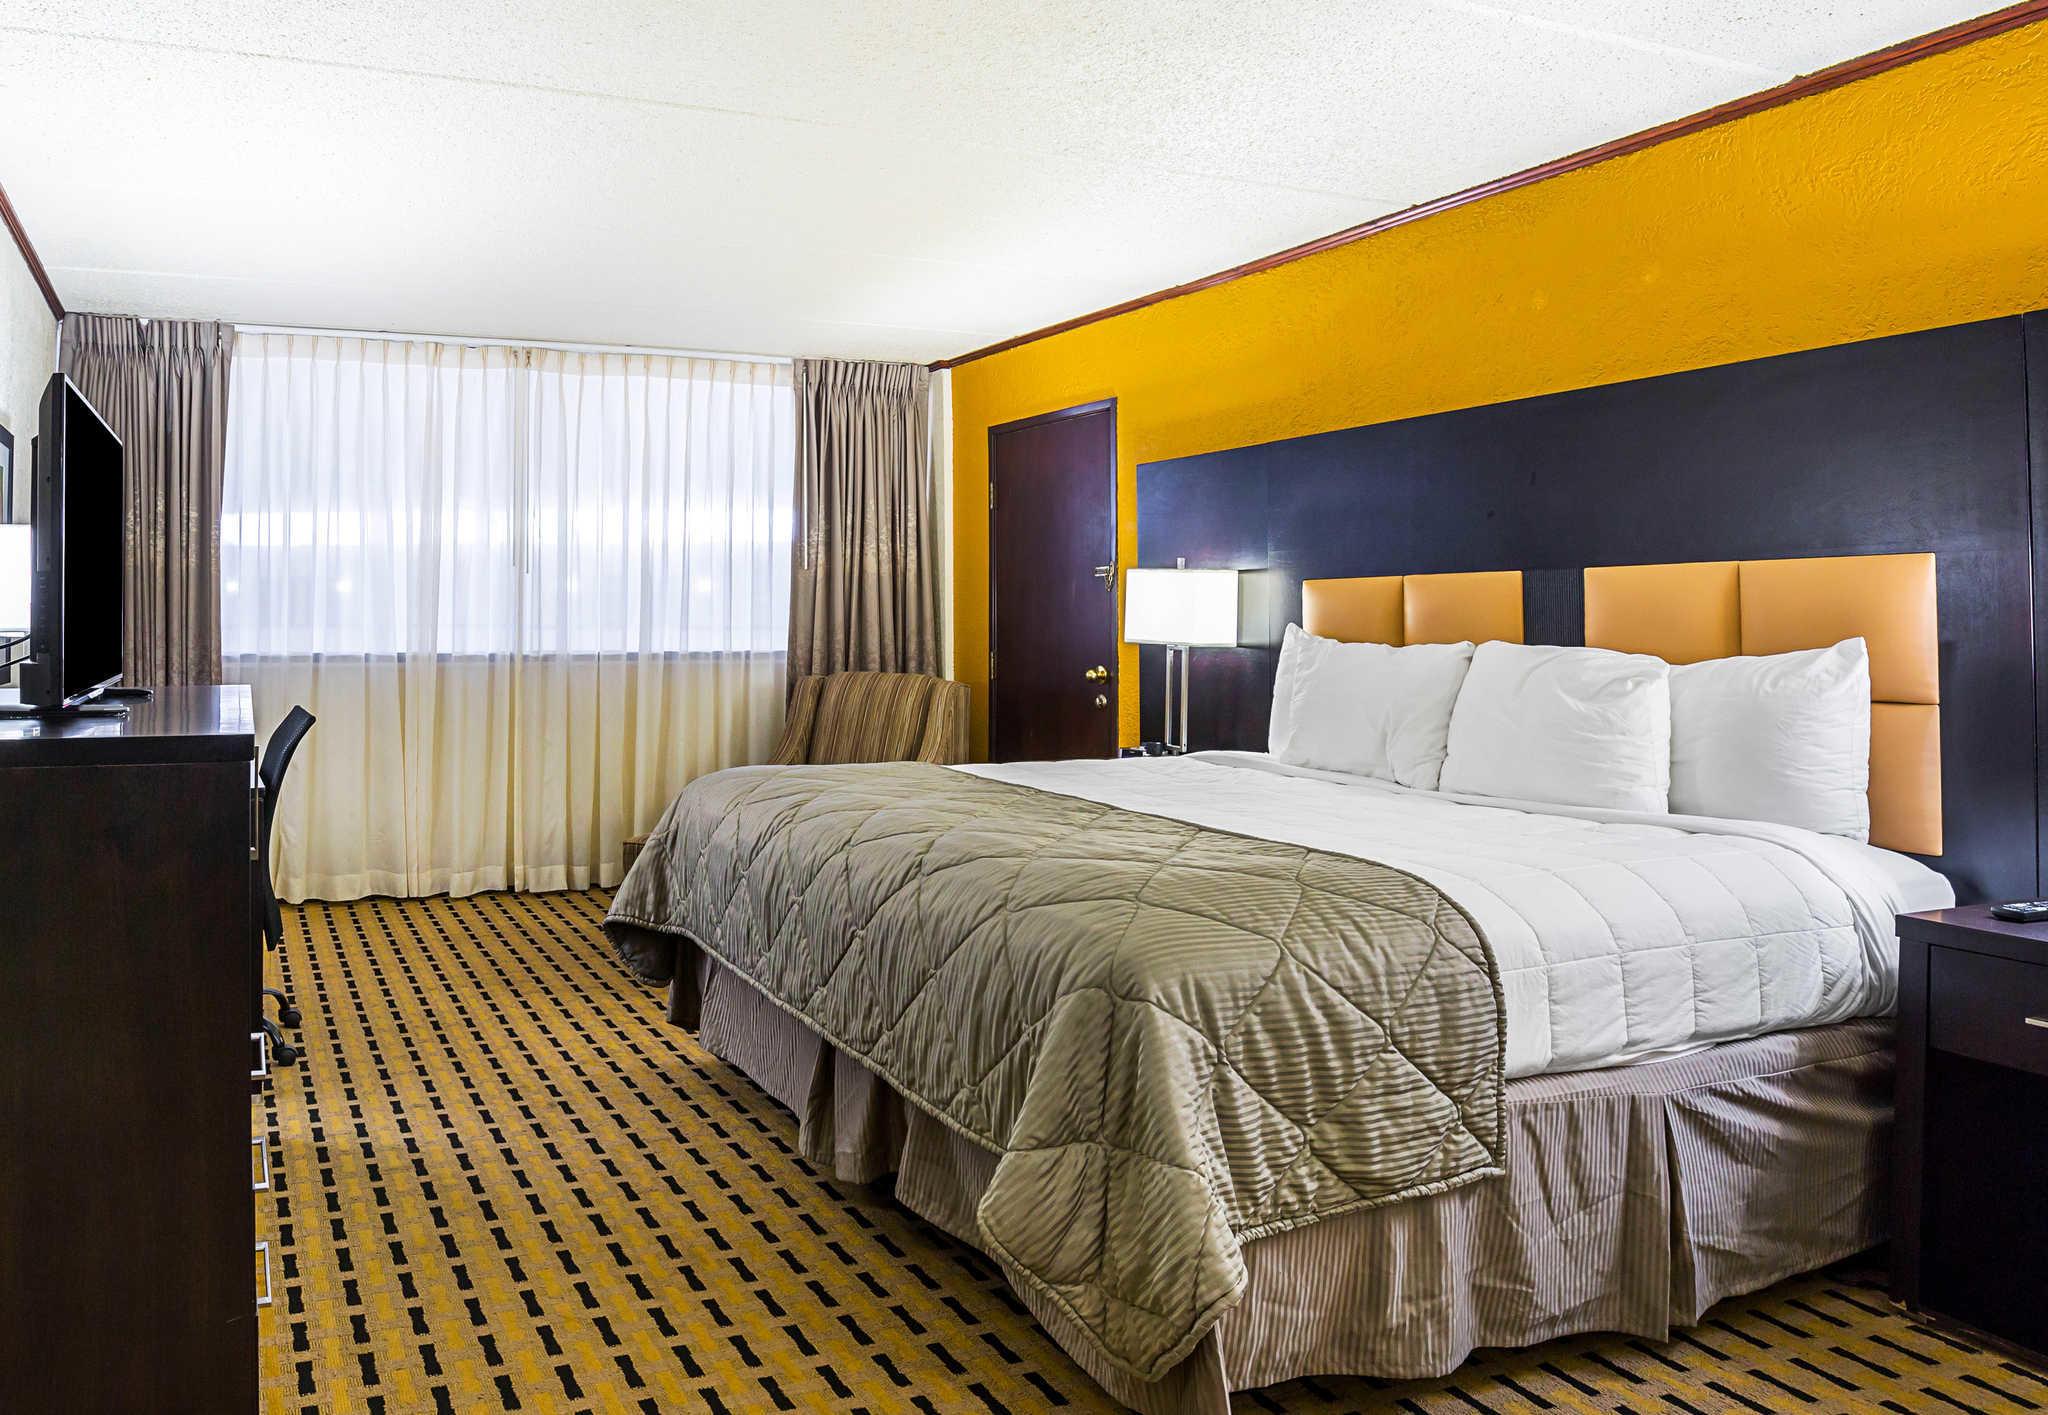 Clarion Inn image 8